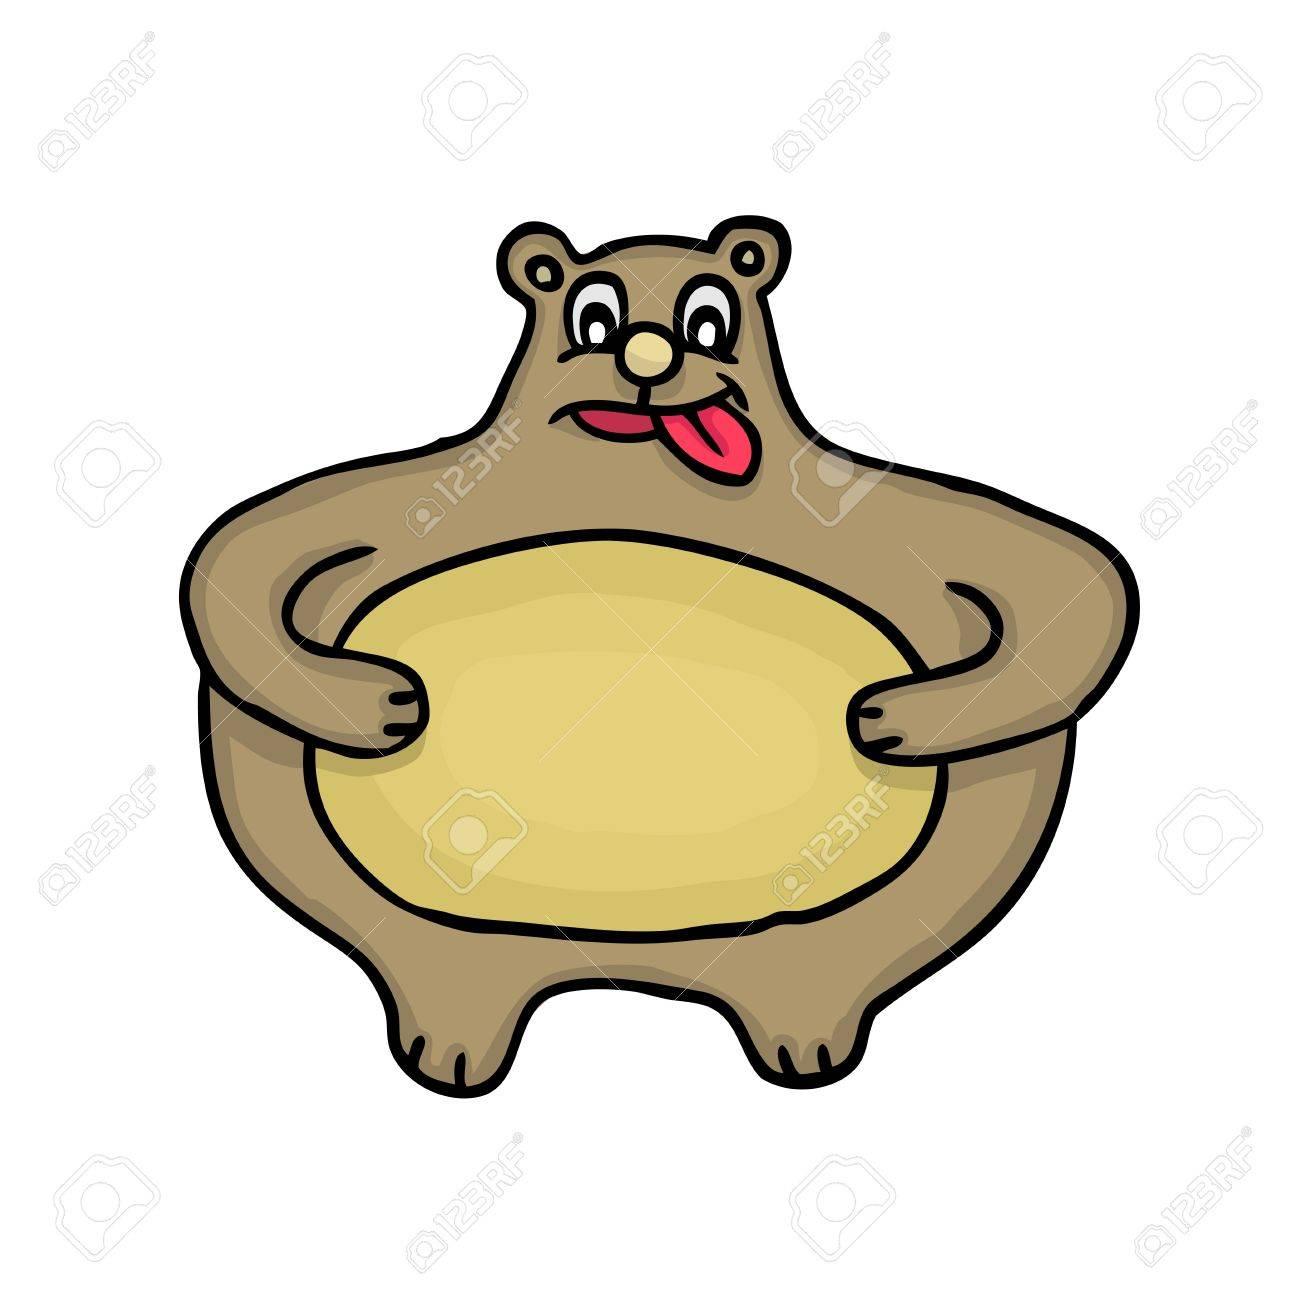 Painted fat bear, vector illustration Stock Vector - 17569875